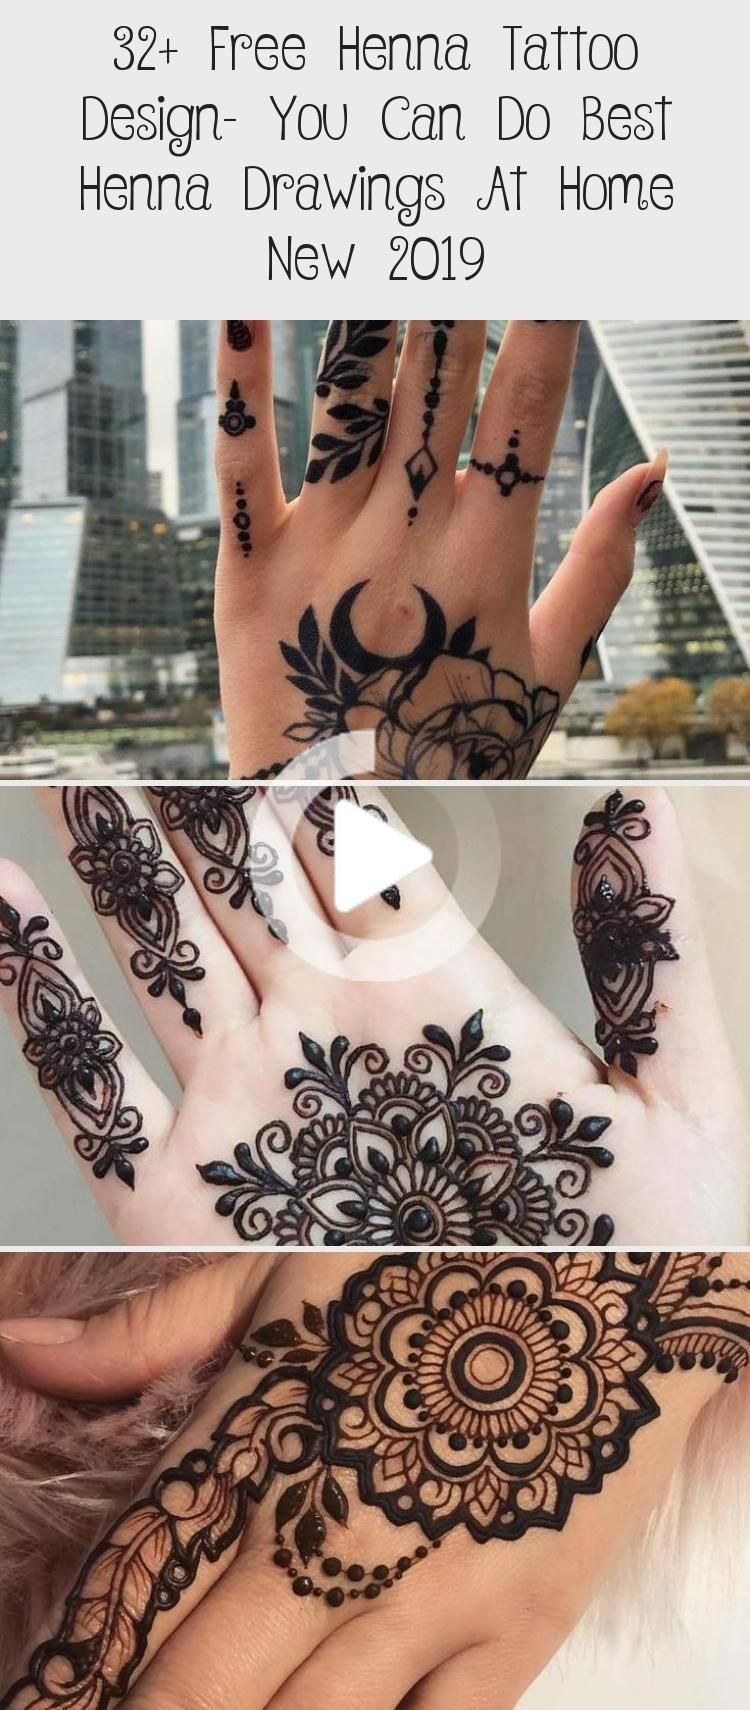 32 Gratis Henna Tattoo Design Kan De Beste Henna Tekeningen Thuis Make New 2019 Tatoeages En Henna Tattoo Henna Tattoo Designs Henna Drawings